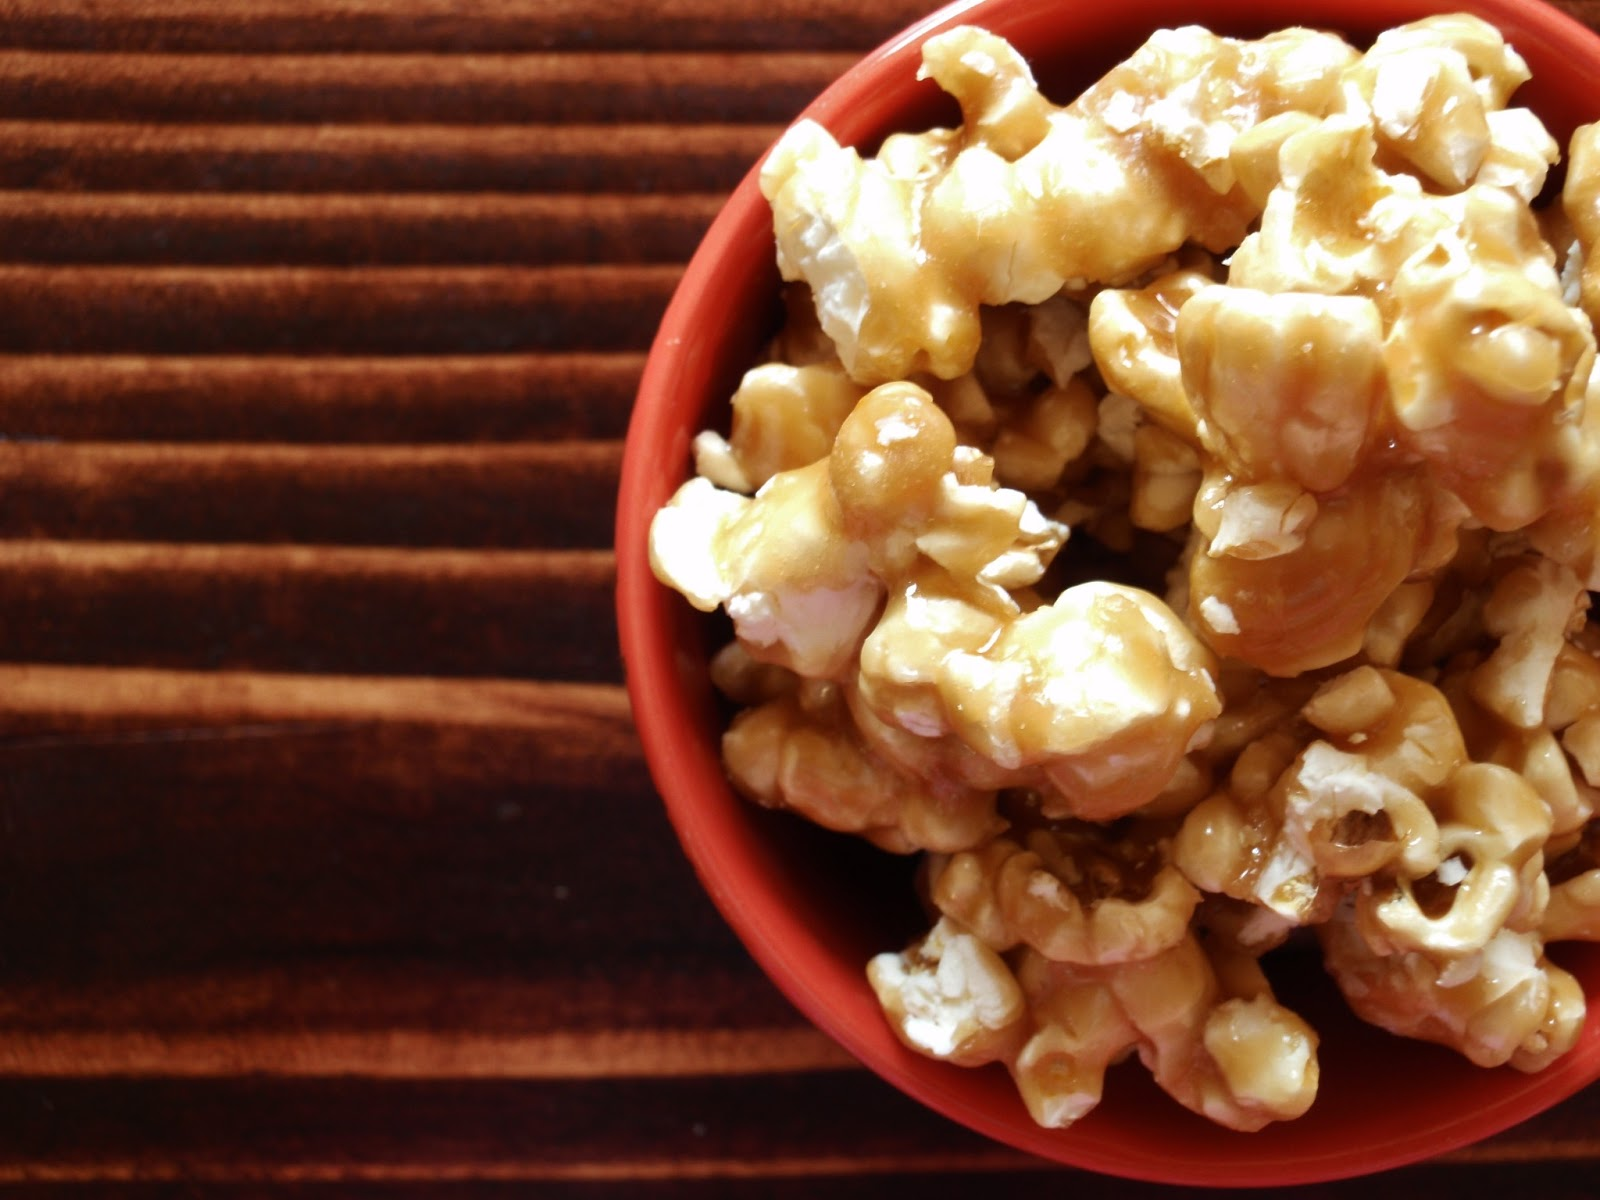 A Creative Cookie: Caramel Corn